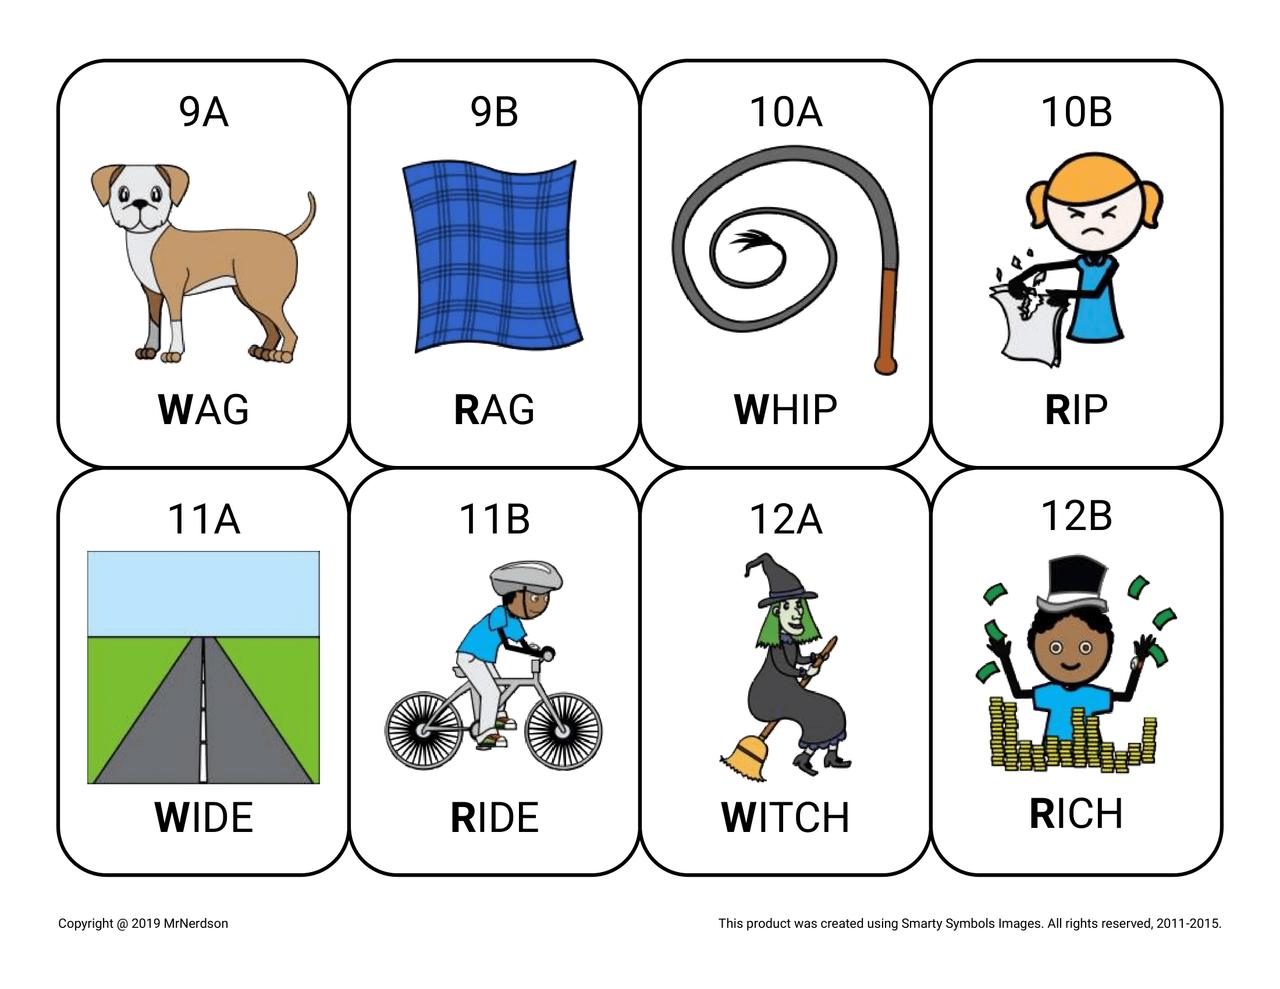 W-R & W-L Minimal Pair Cards